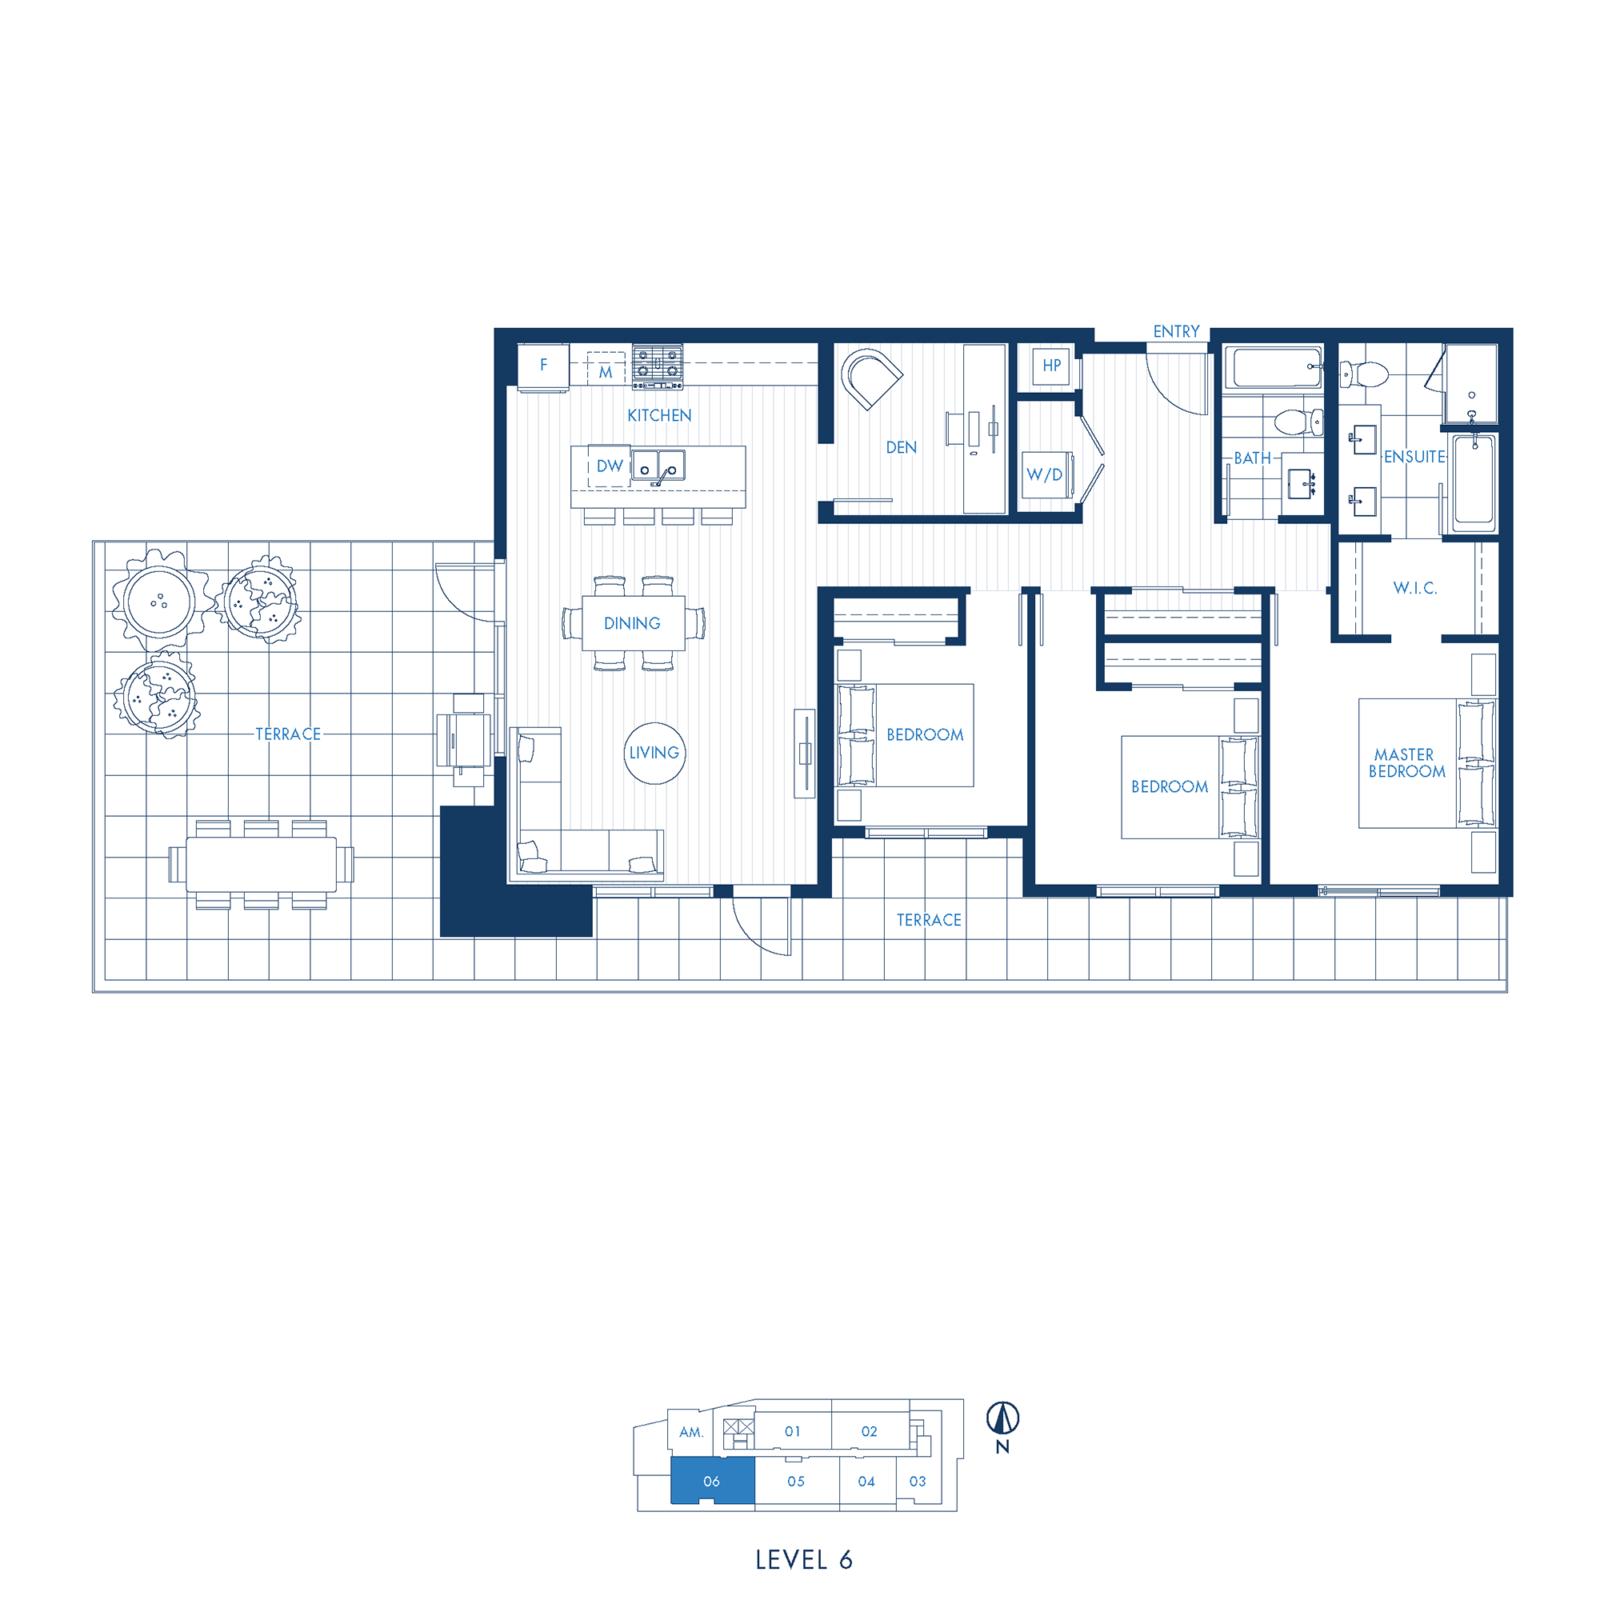 North Building Plan L1